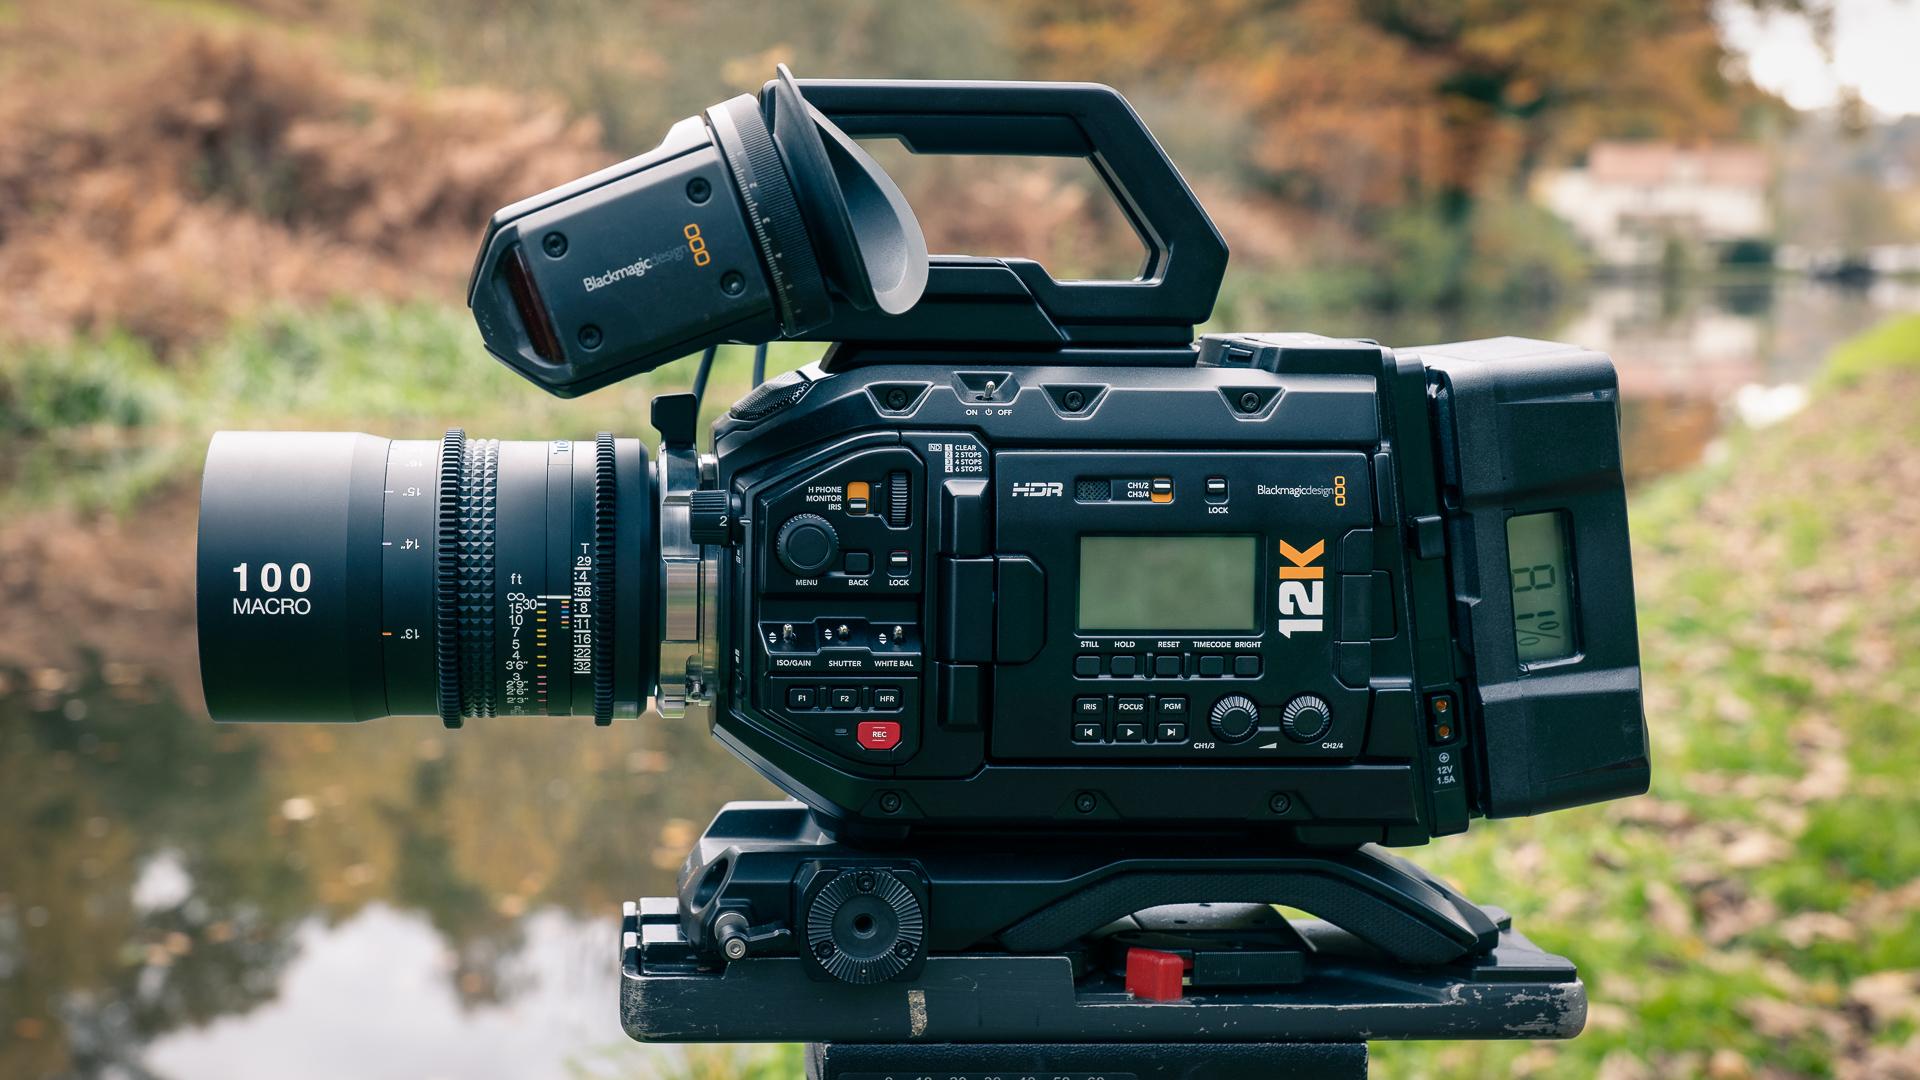 URSA Mini Pro 12K with Tokina 100mm Macro lens wide shot